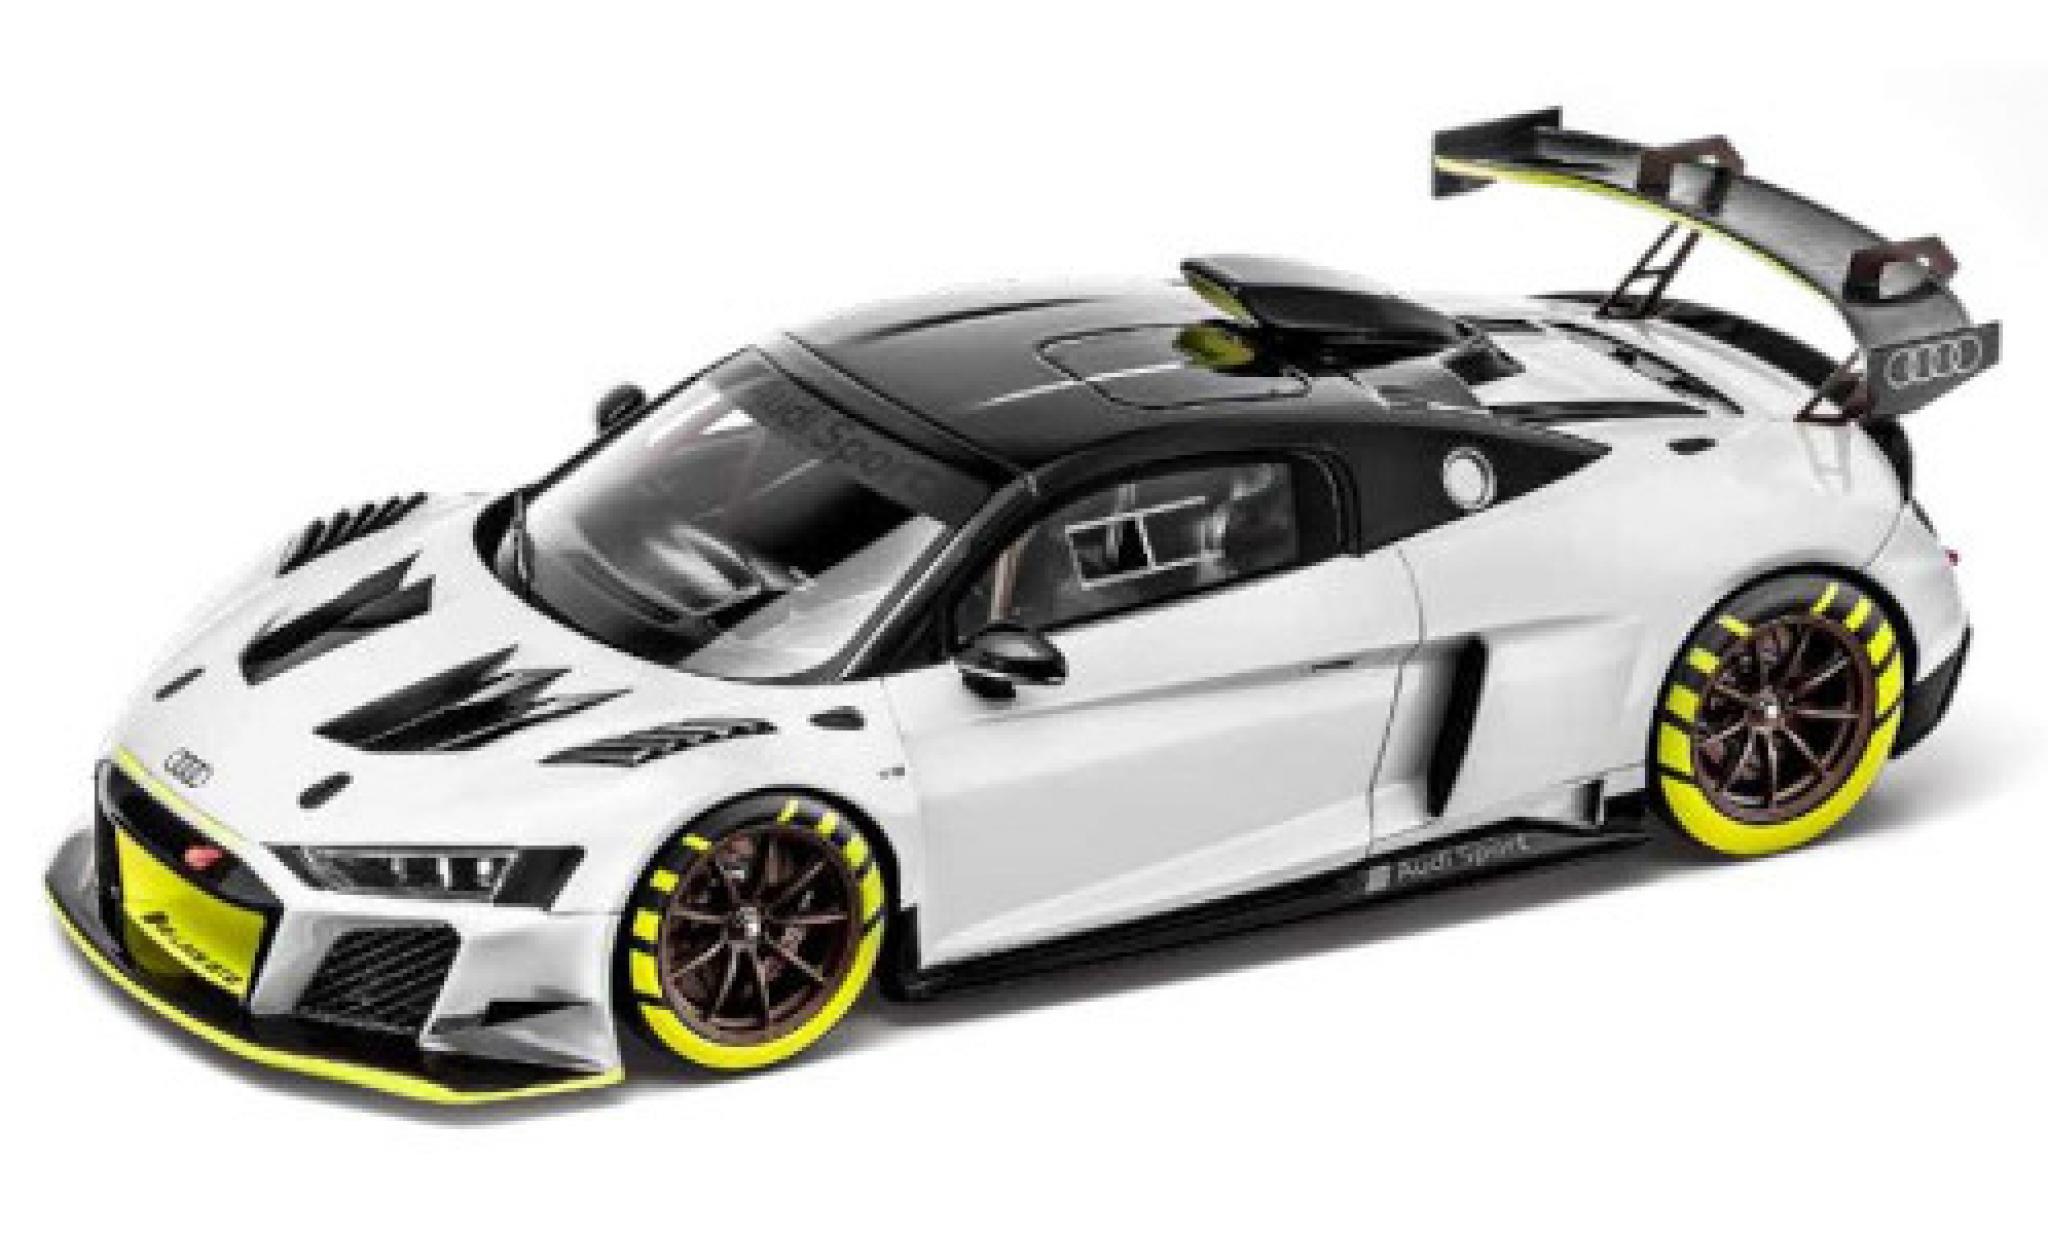 Audi R8 1/18 I Spark LMS GT2 metallise grey/Dekor 2020 véhicule de présentation